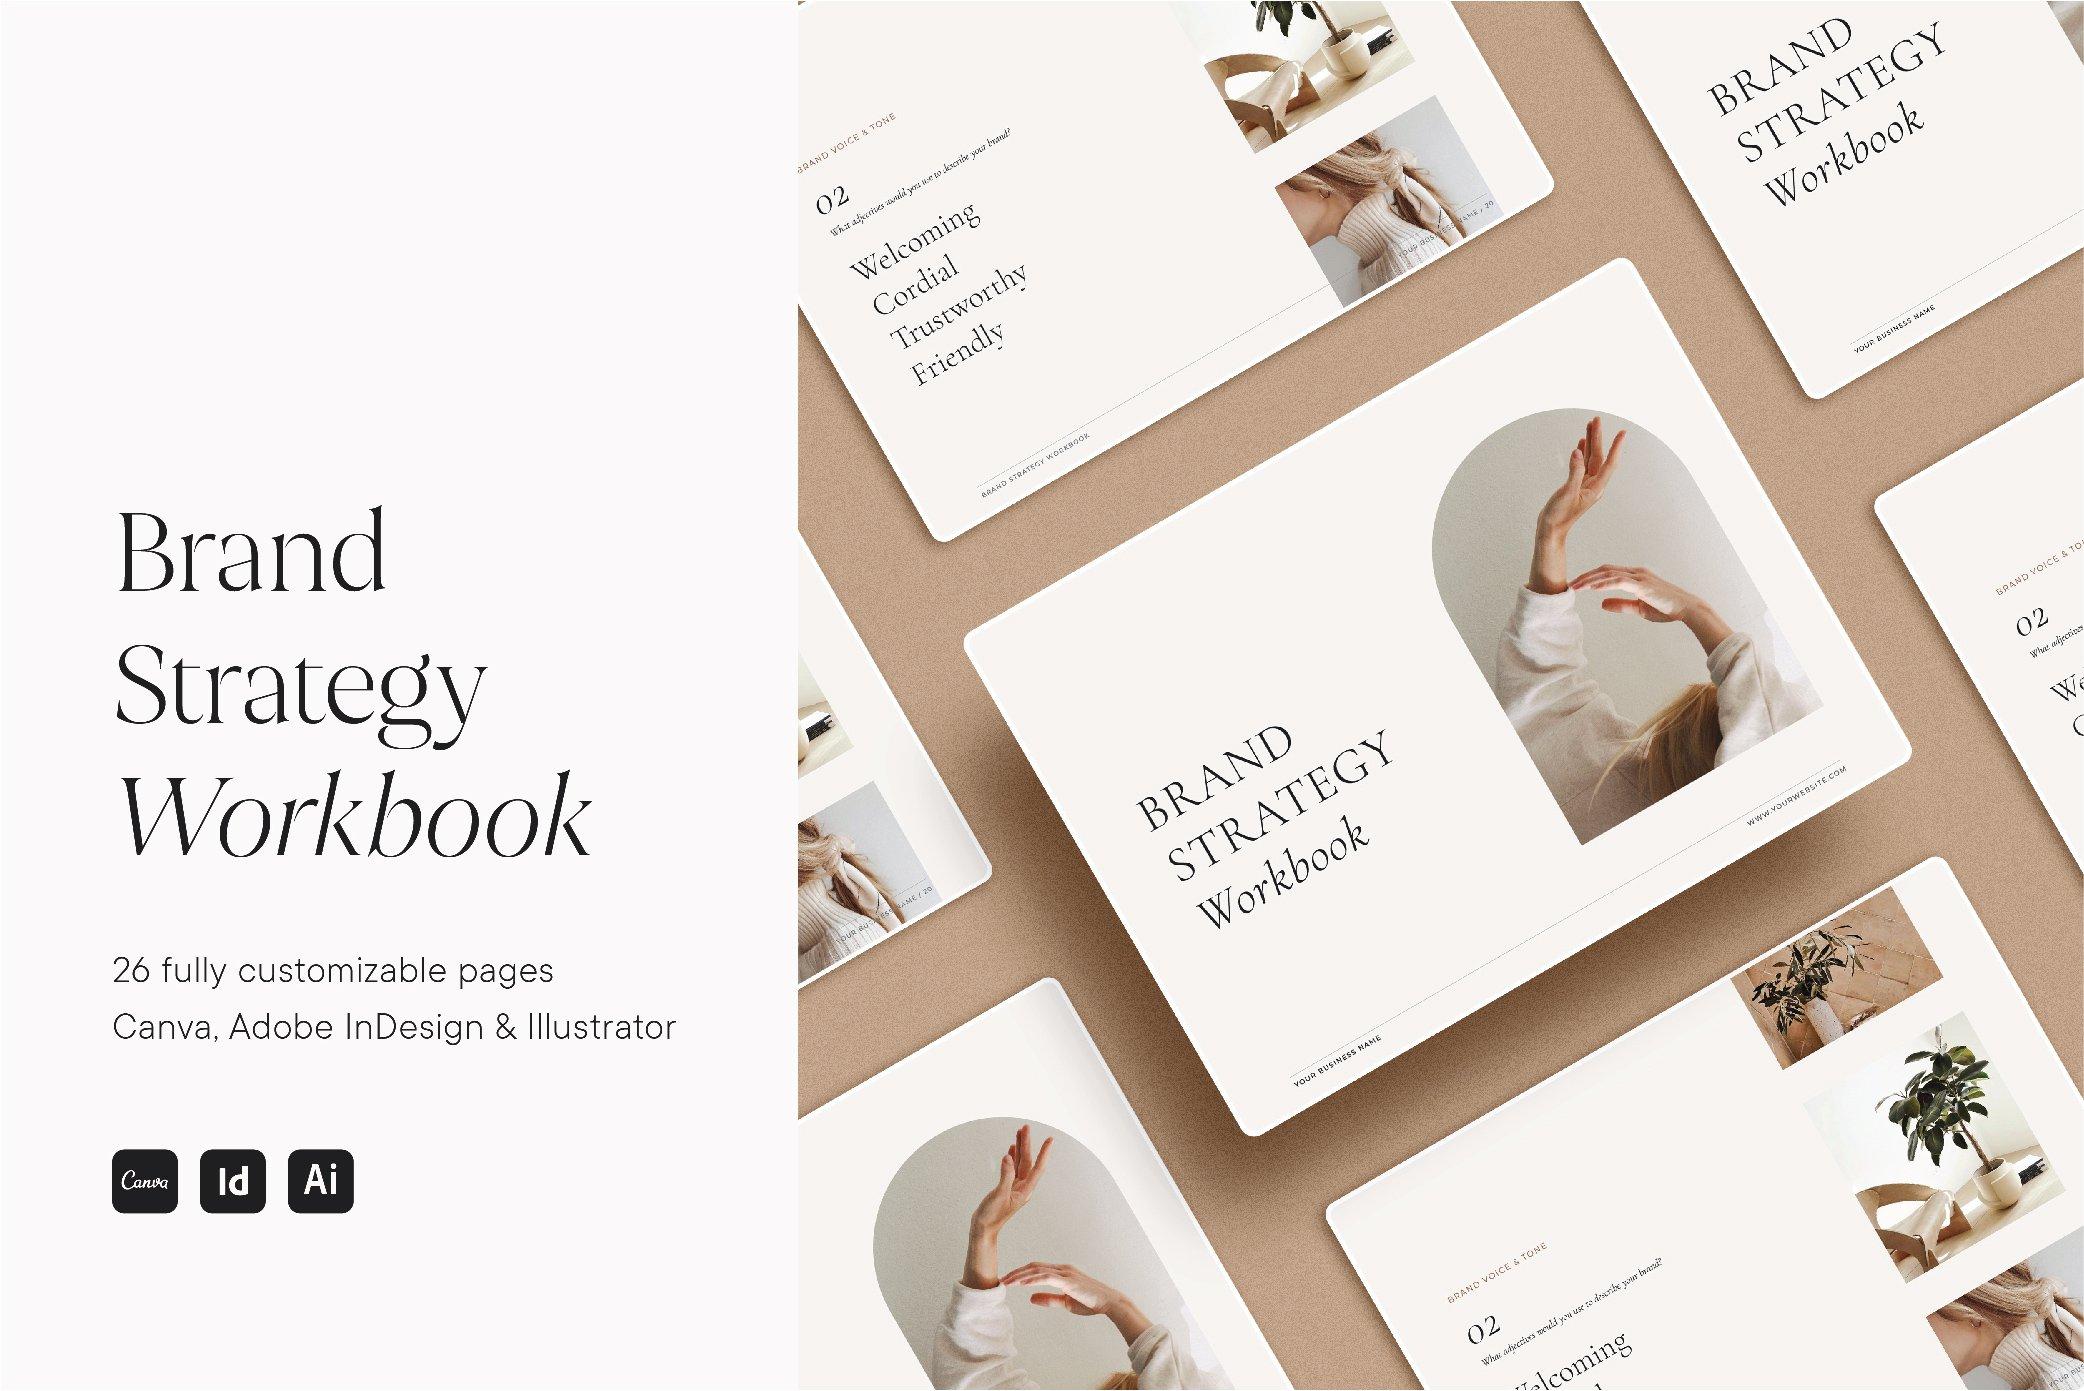 Brand Strategy Workbook Creative Other Presentation Software Templates Creative Market